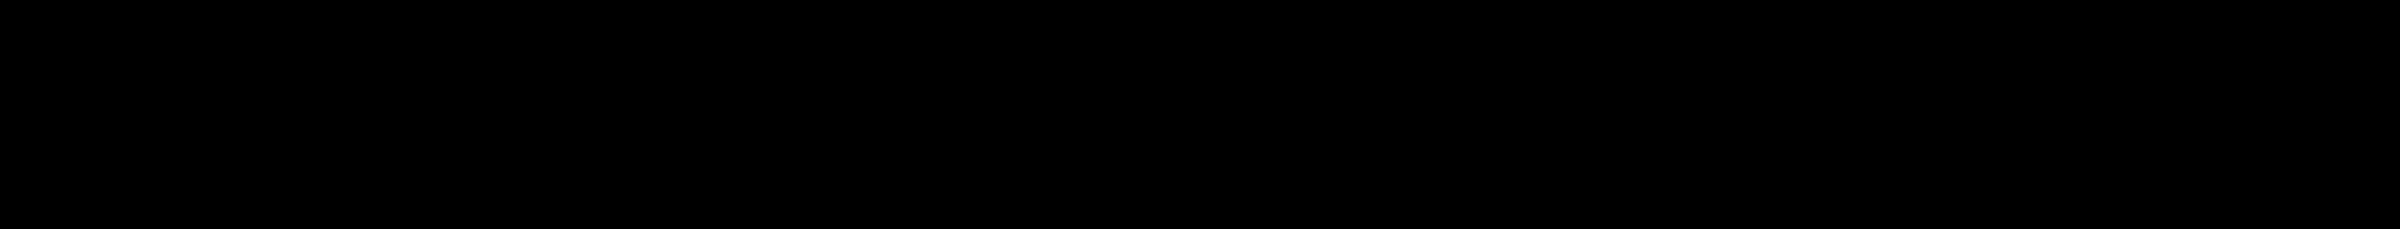 Emporio Armani Logo PNG - 179941